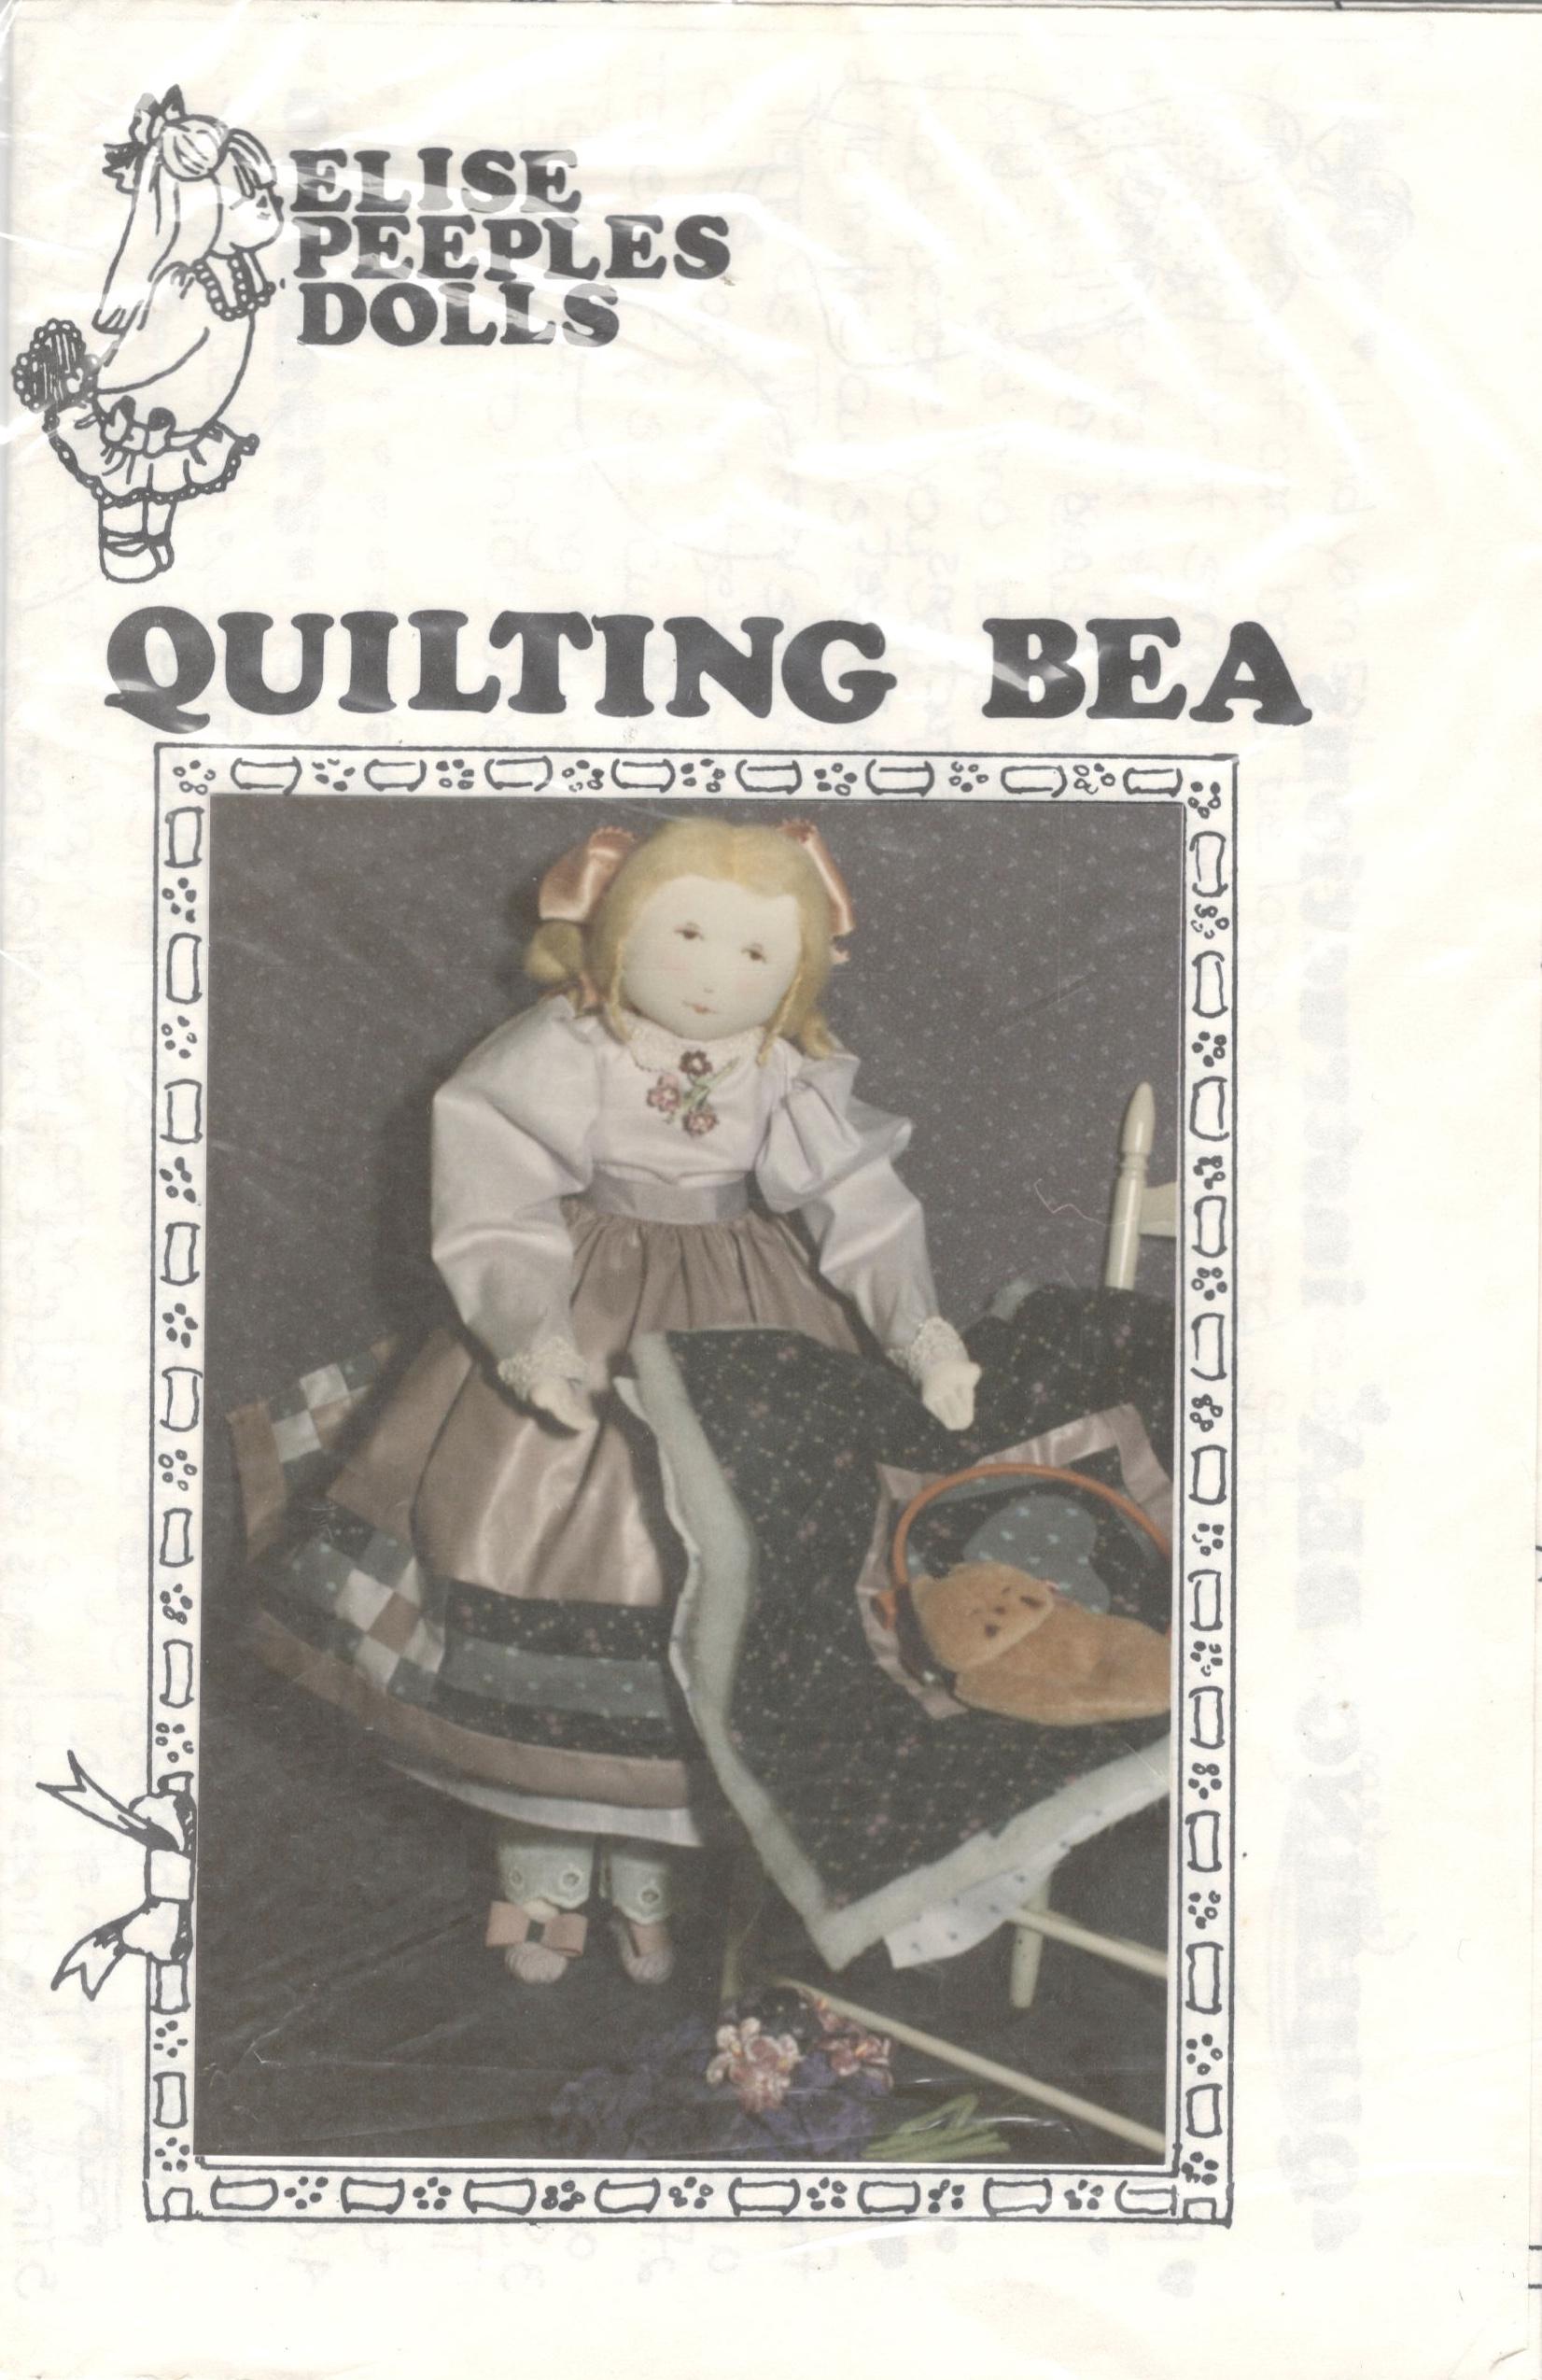 Elise Peeples Dolls - Quilting Bea